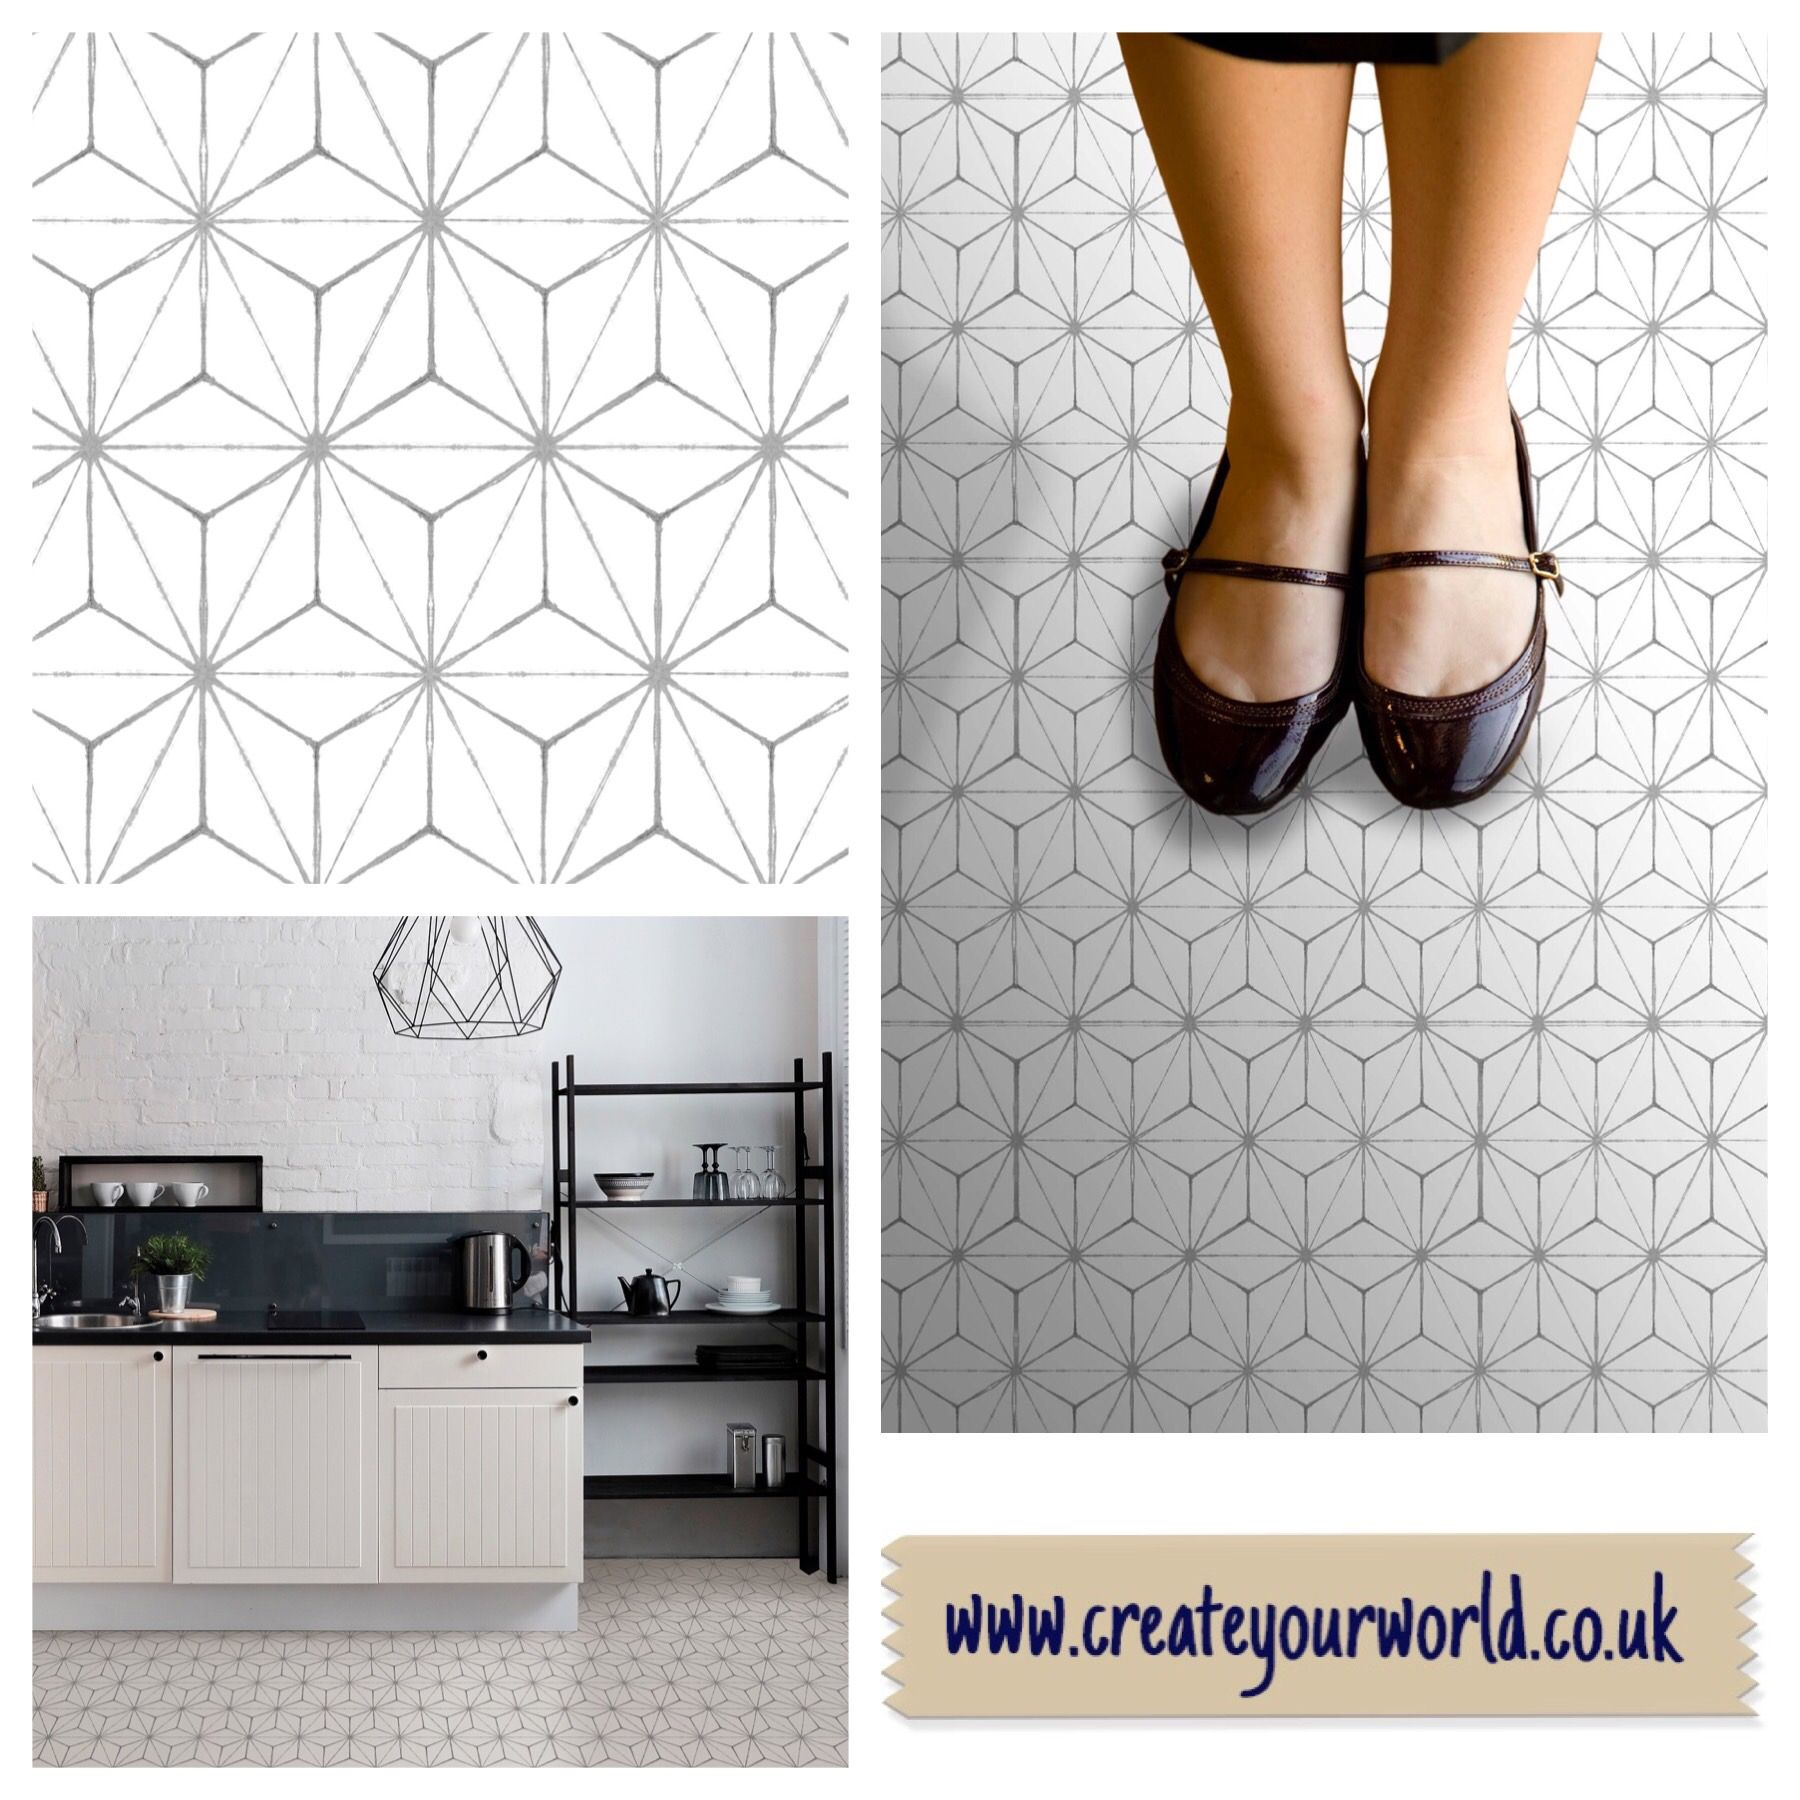 30 48m X Geometric Kikko Grey White Premium Self Adhesive Vinyl Floor Tiles Fp2481 Flooring Tile